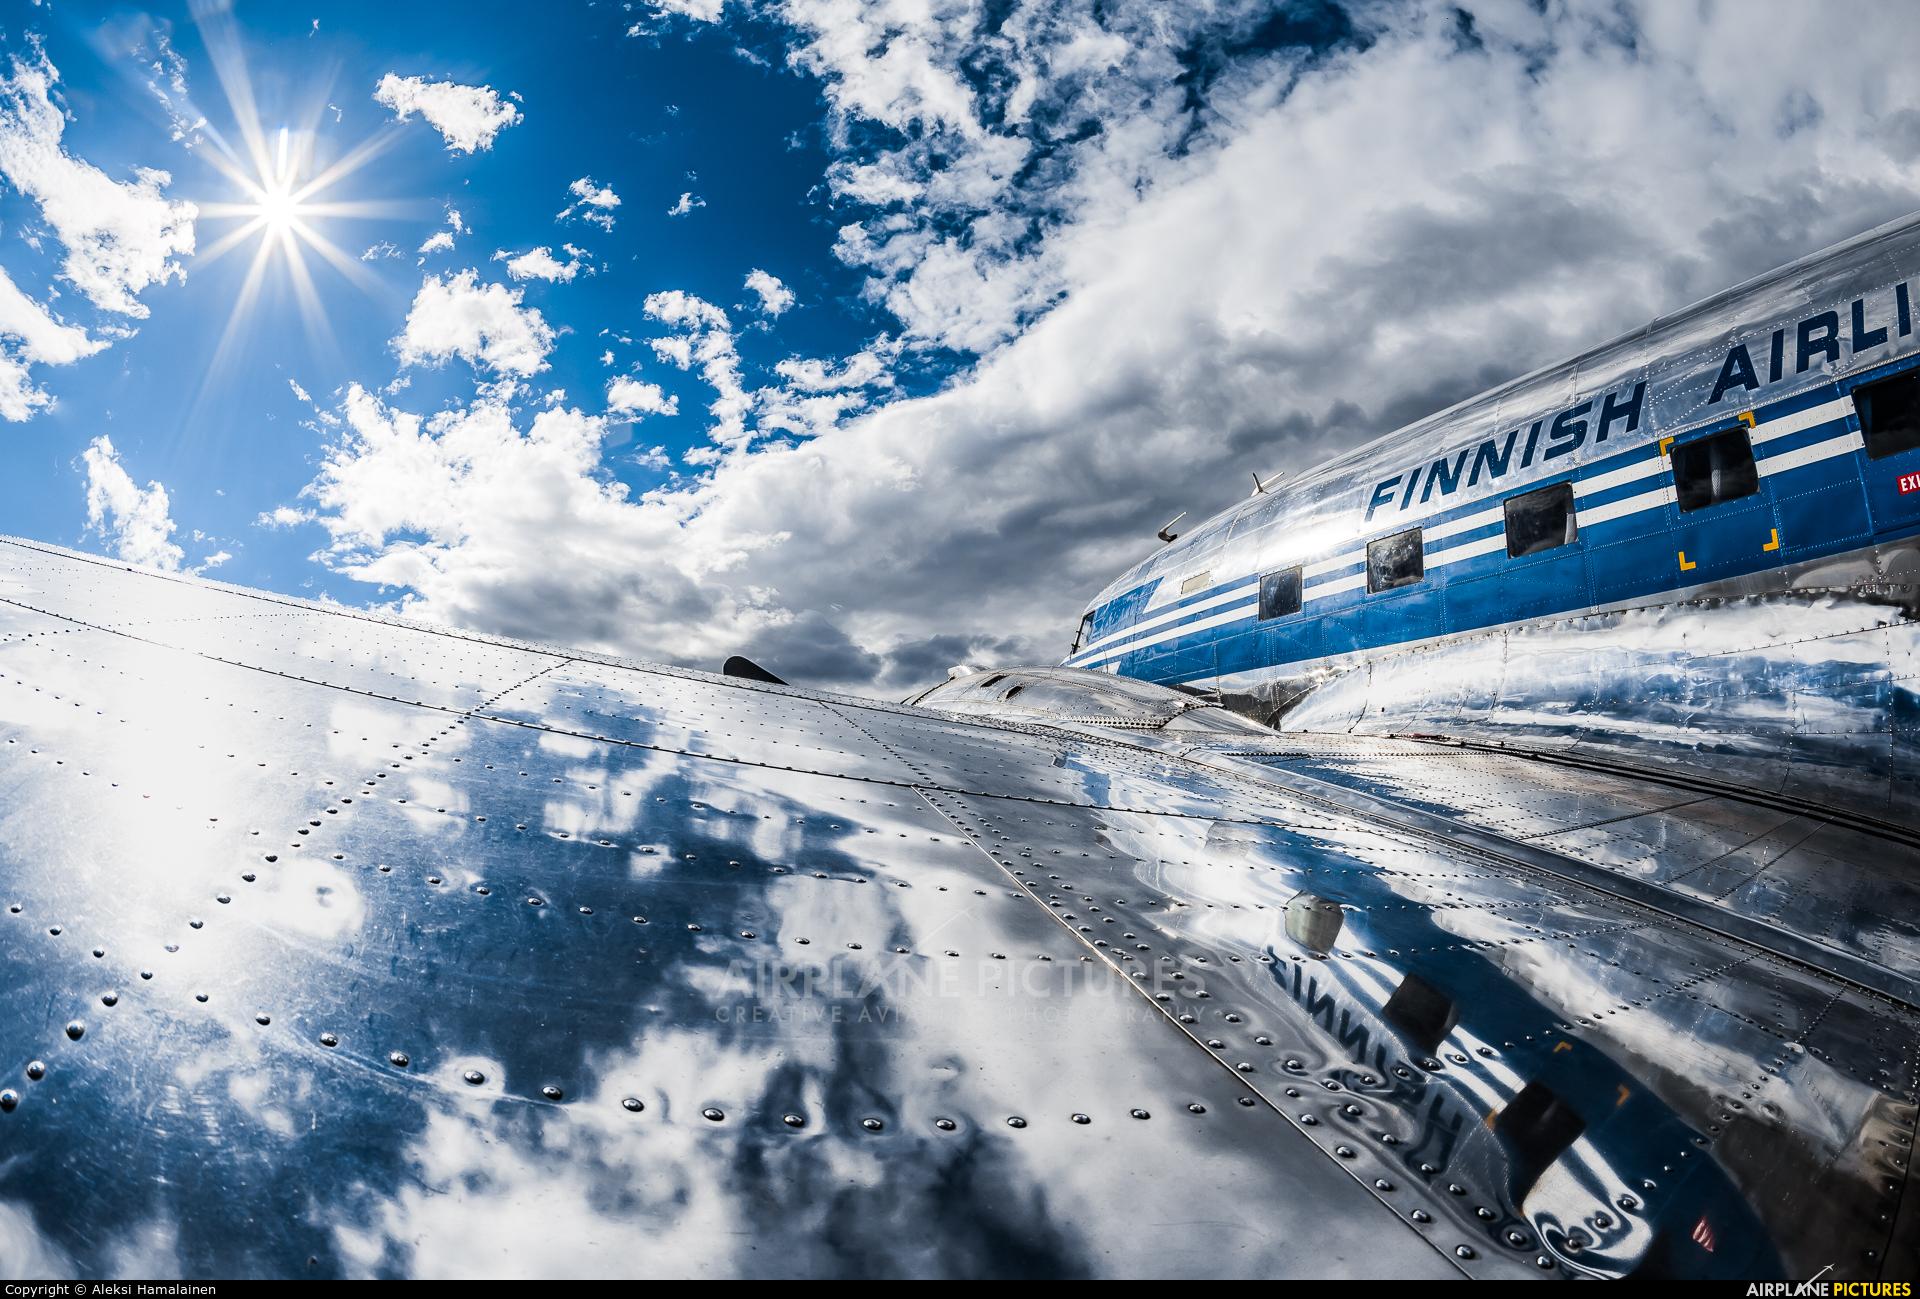 Aero - Finnish Airlines (Airveteran) OH-LCH aircraft at Helsinki - Malmi